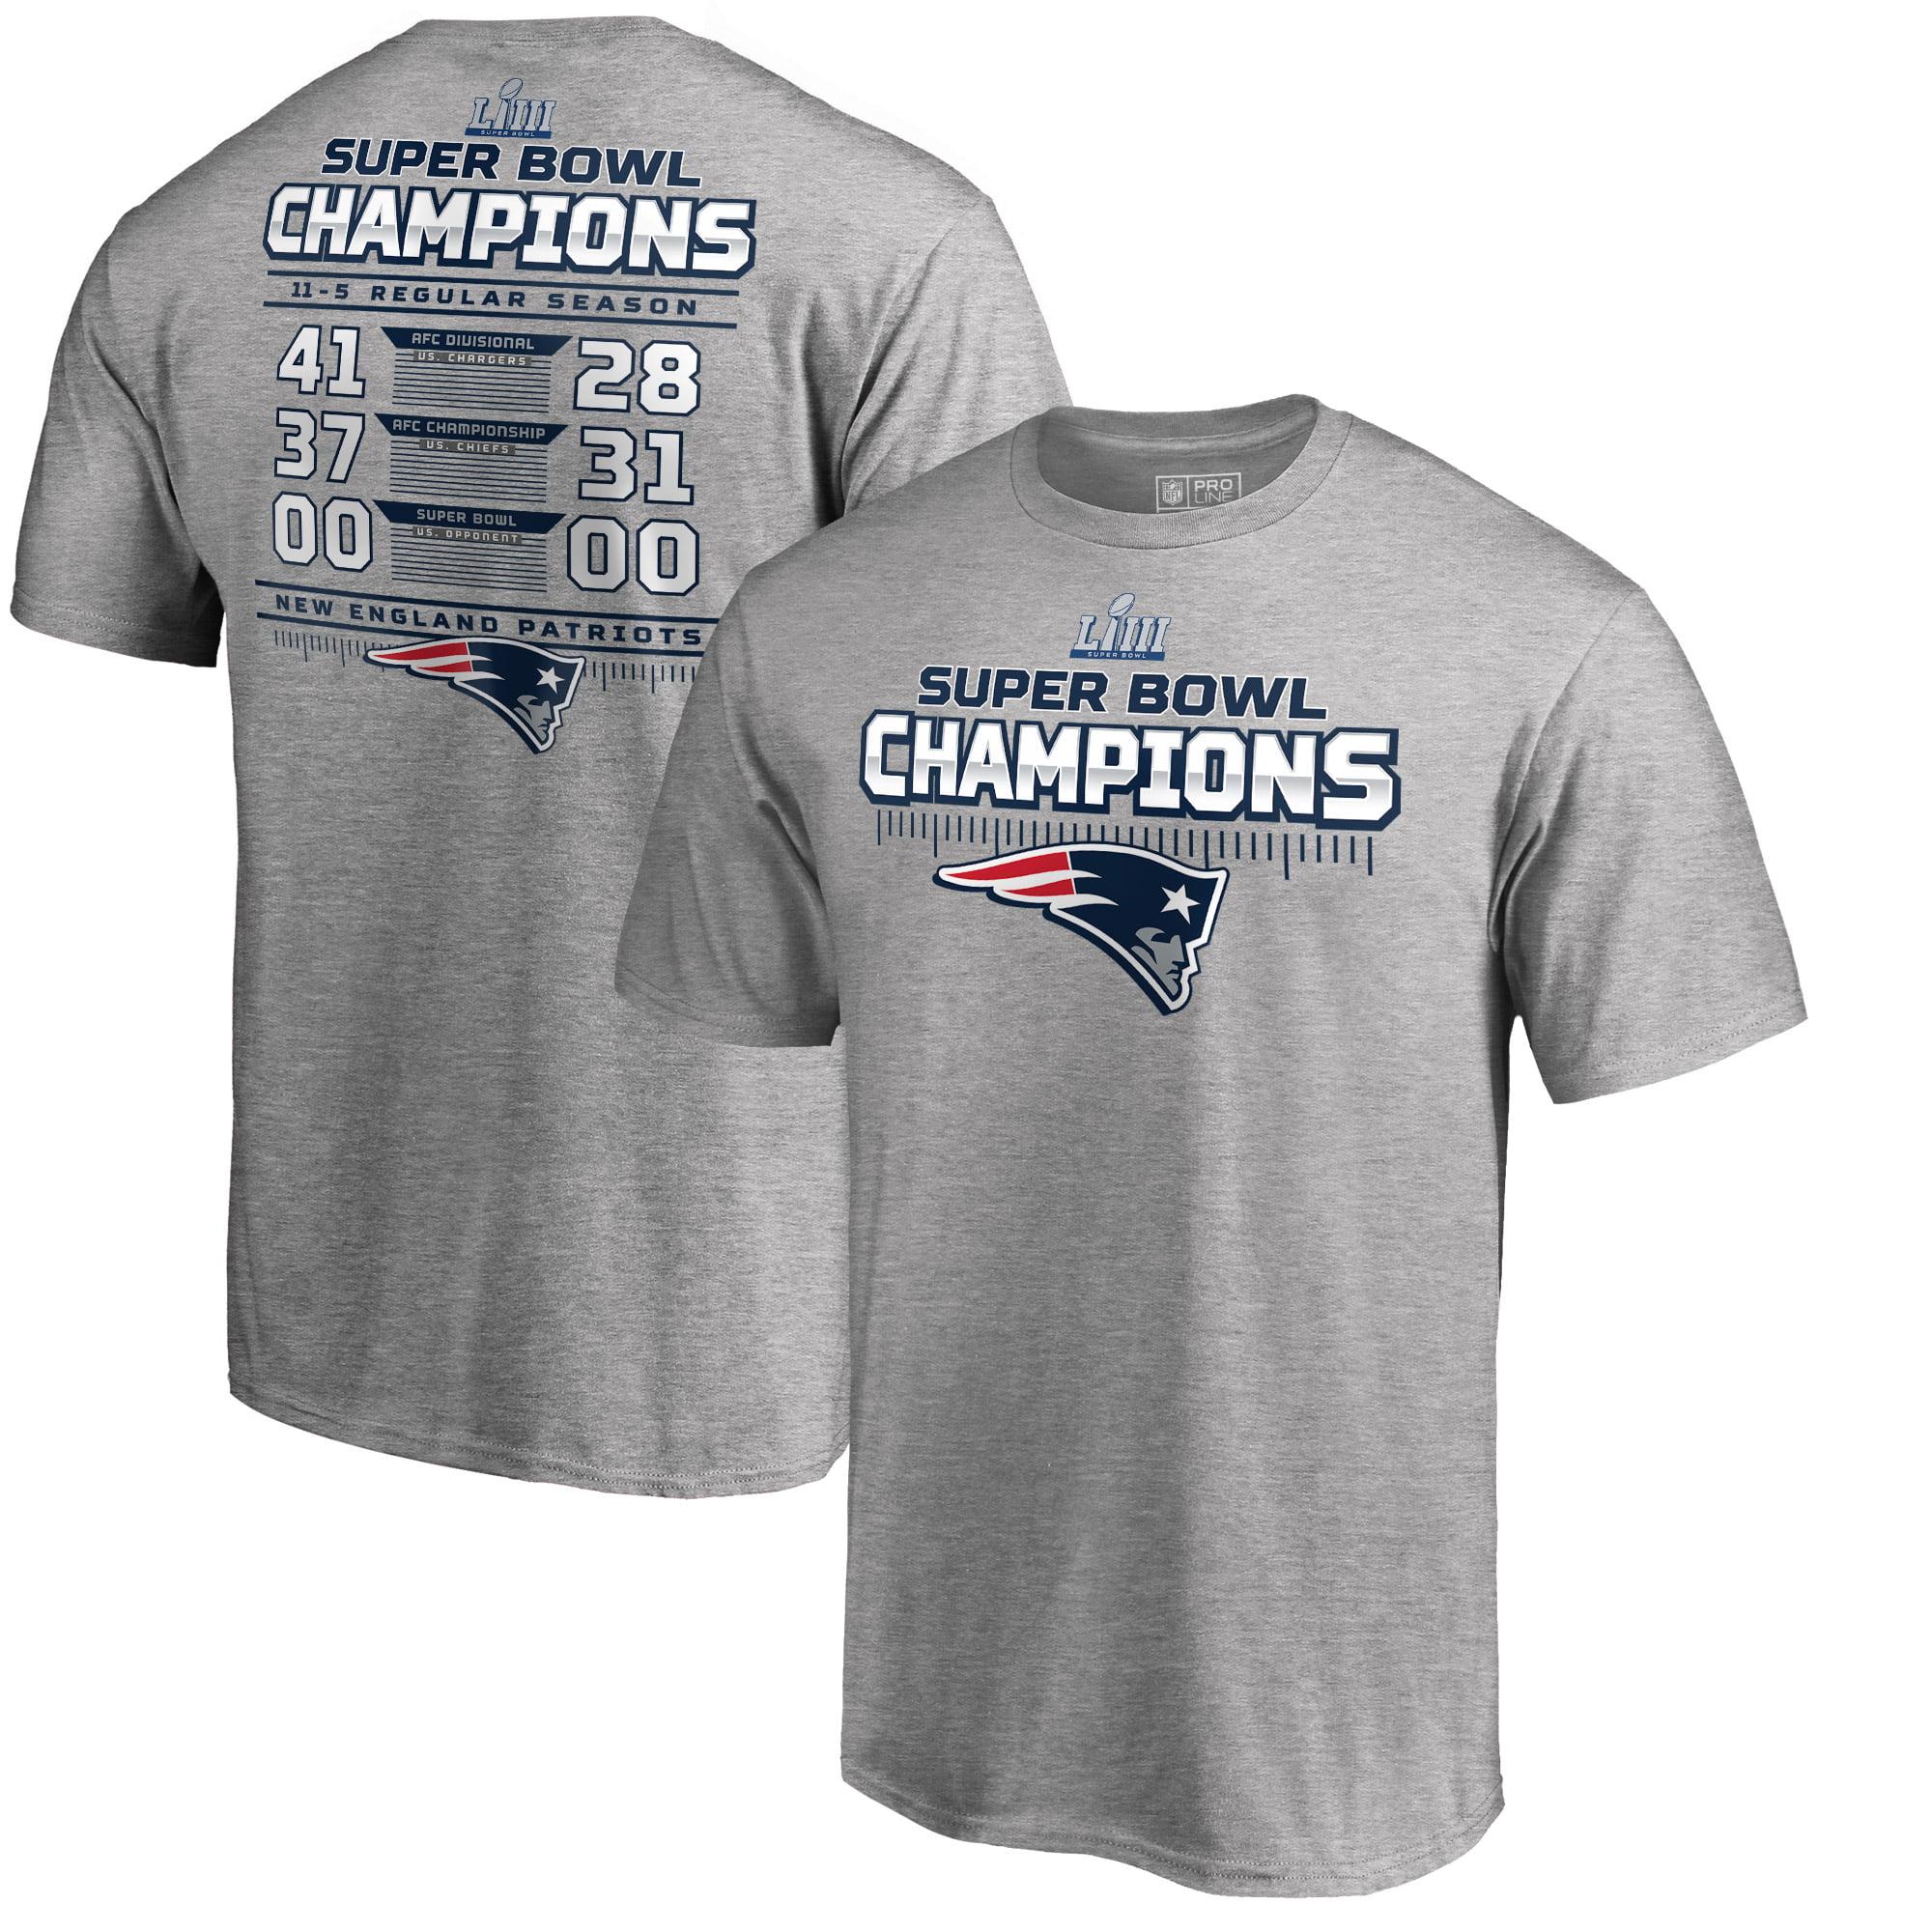 New England Patriots NFL Pro Line by Fanatics Branded Super Bowl LIII Champions Interception Schedule T-Shirt - Heather Gray